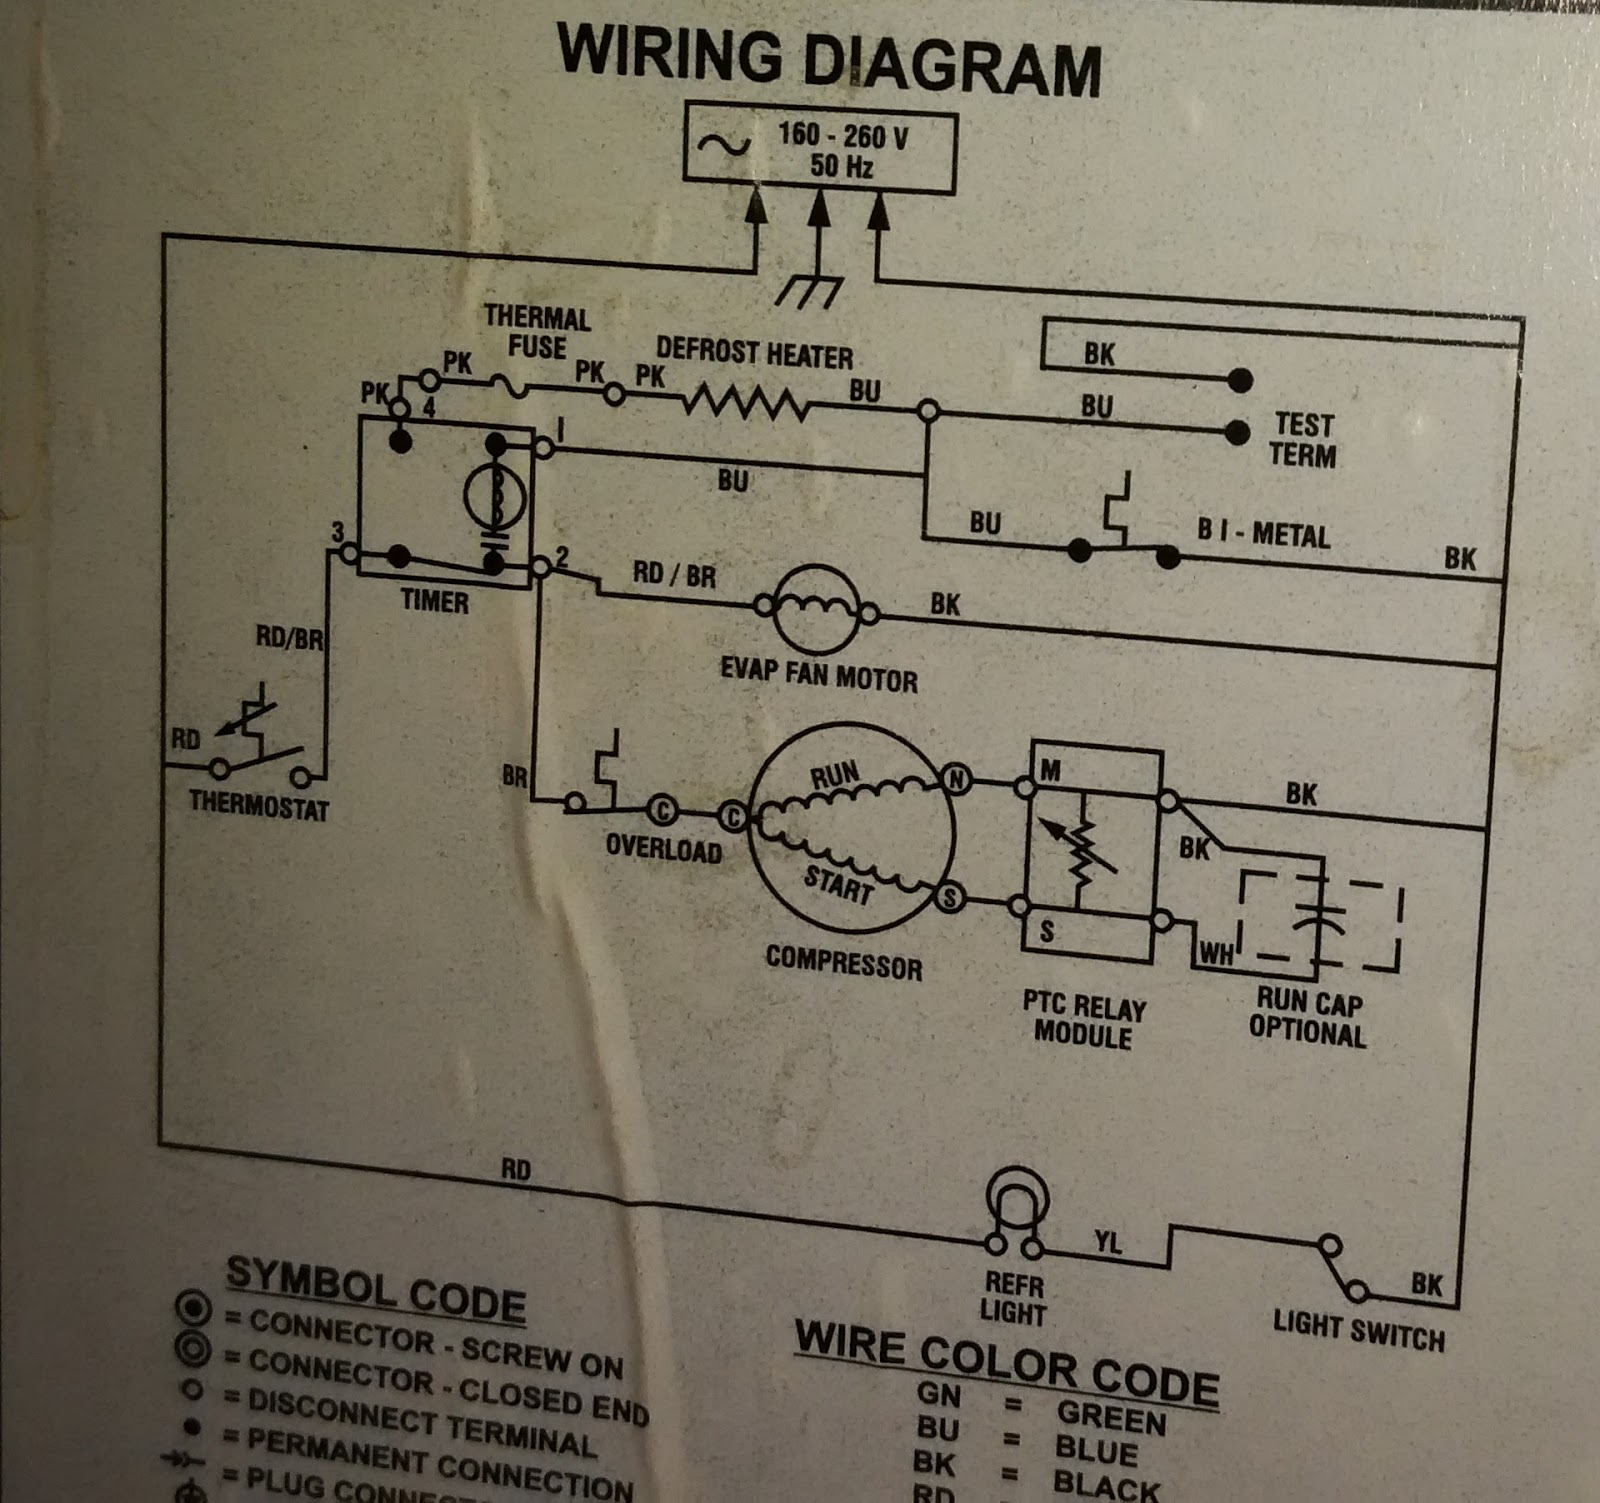 Bmw E30 Vacuum Hose Diagram In Addition Wiring Diagram Bmw E39 Dsp